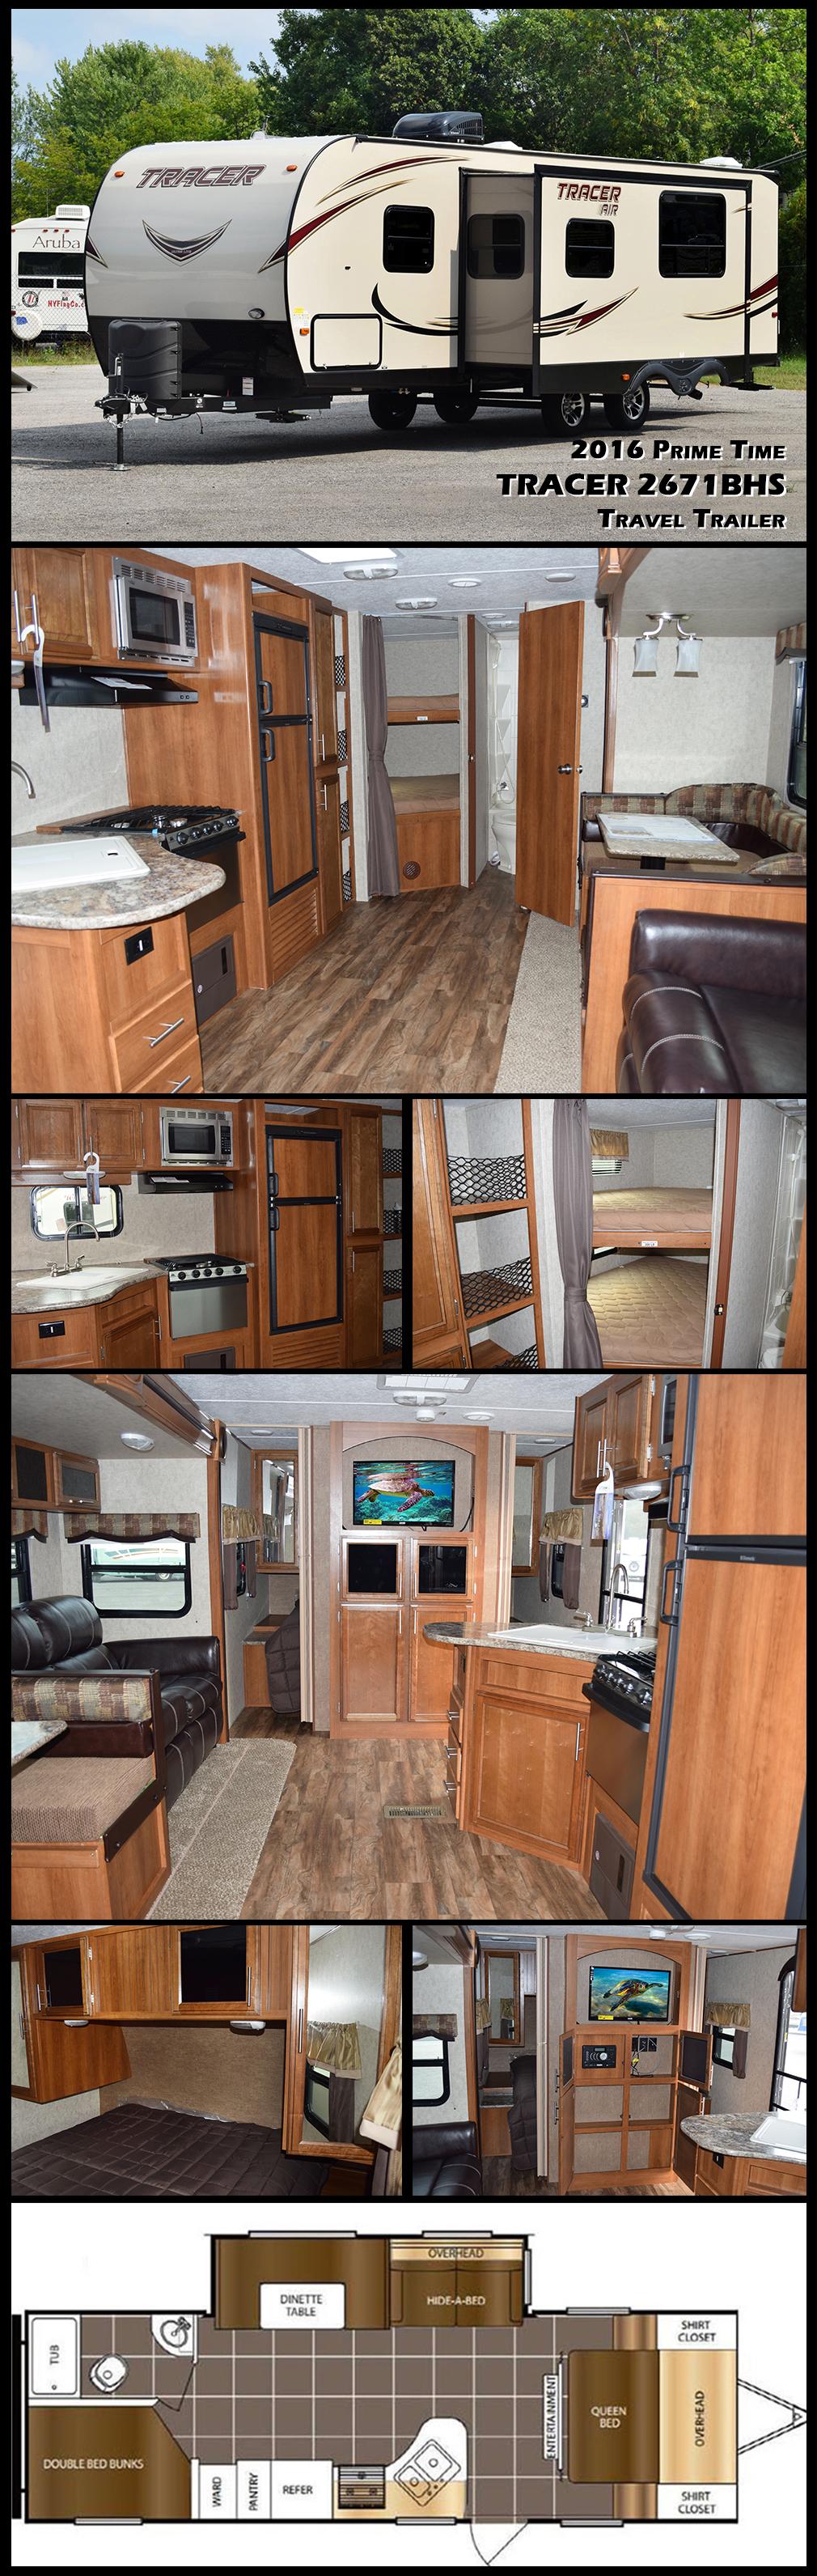 2016 Prime Time Tracer T18604 Travel trailer floor